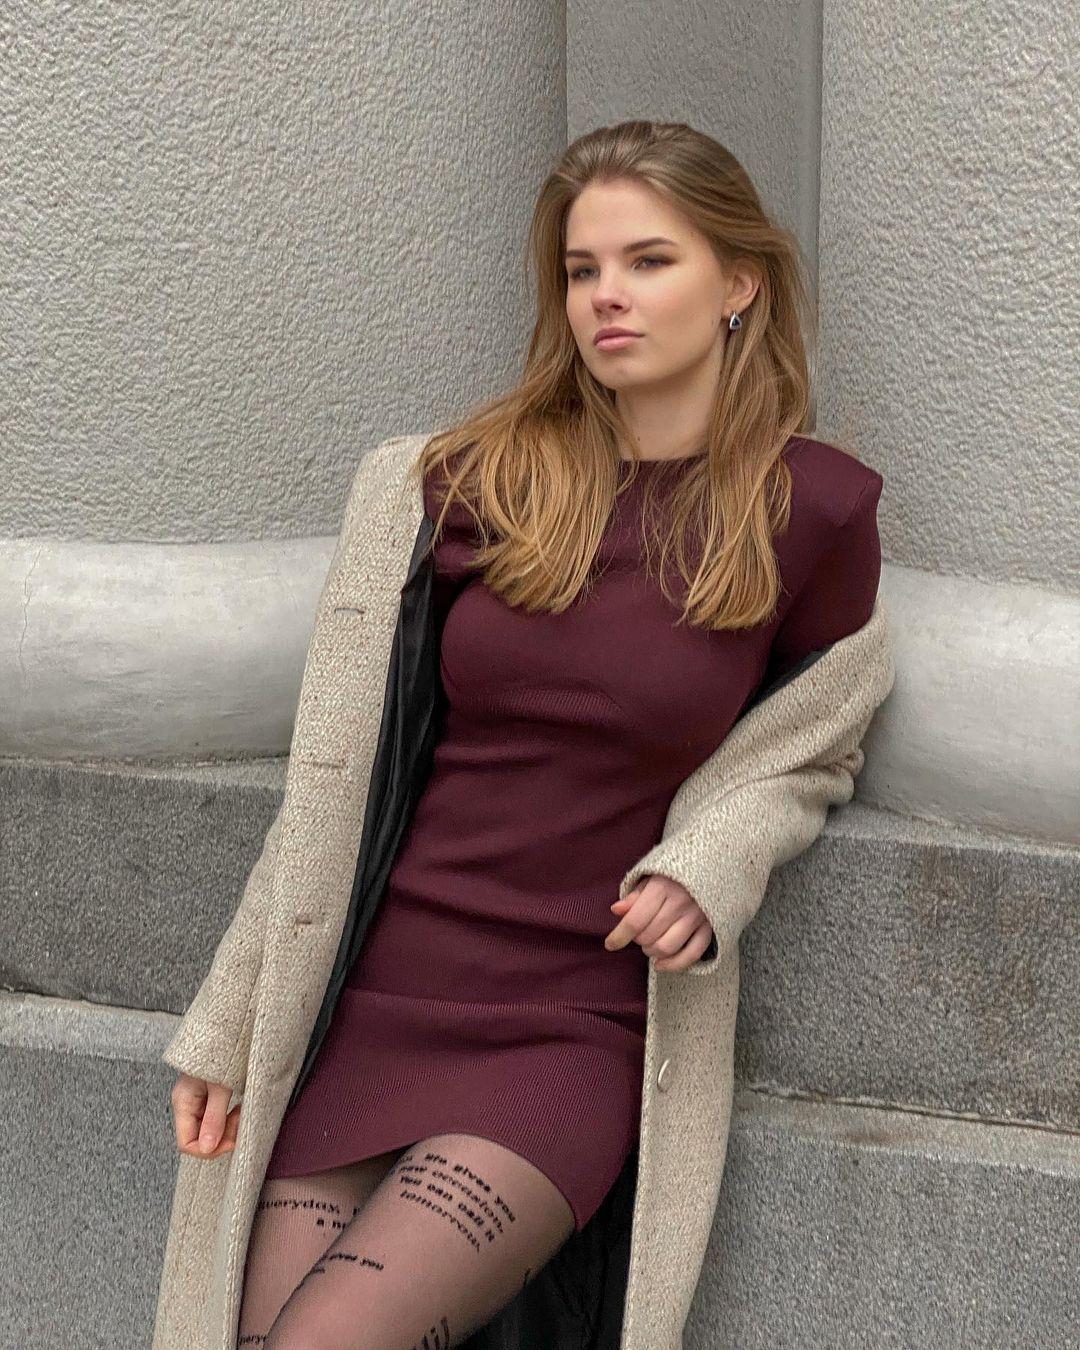 Mariia-Arsentieva-Wallpapers-Insta-Fit-Bio-4